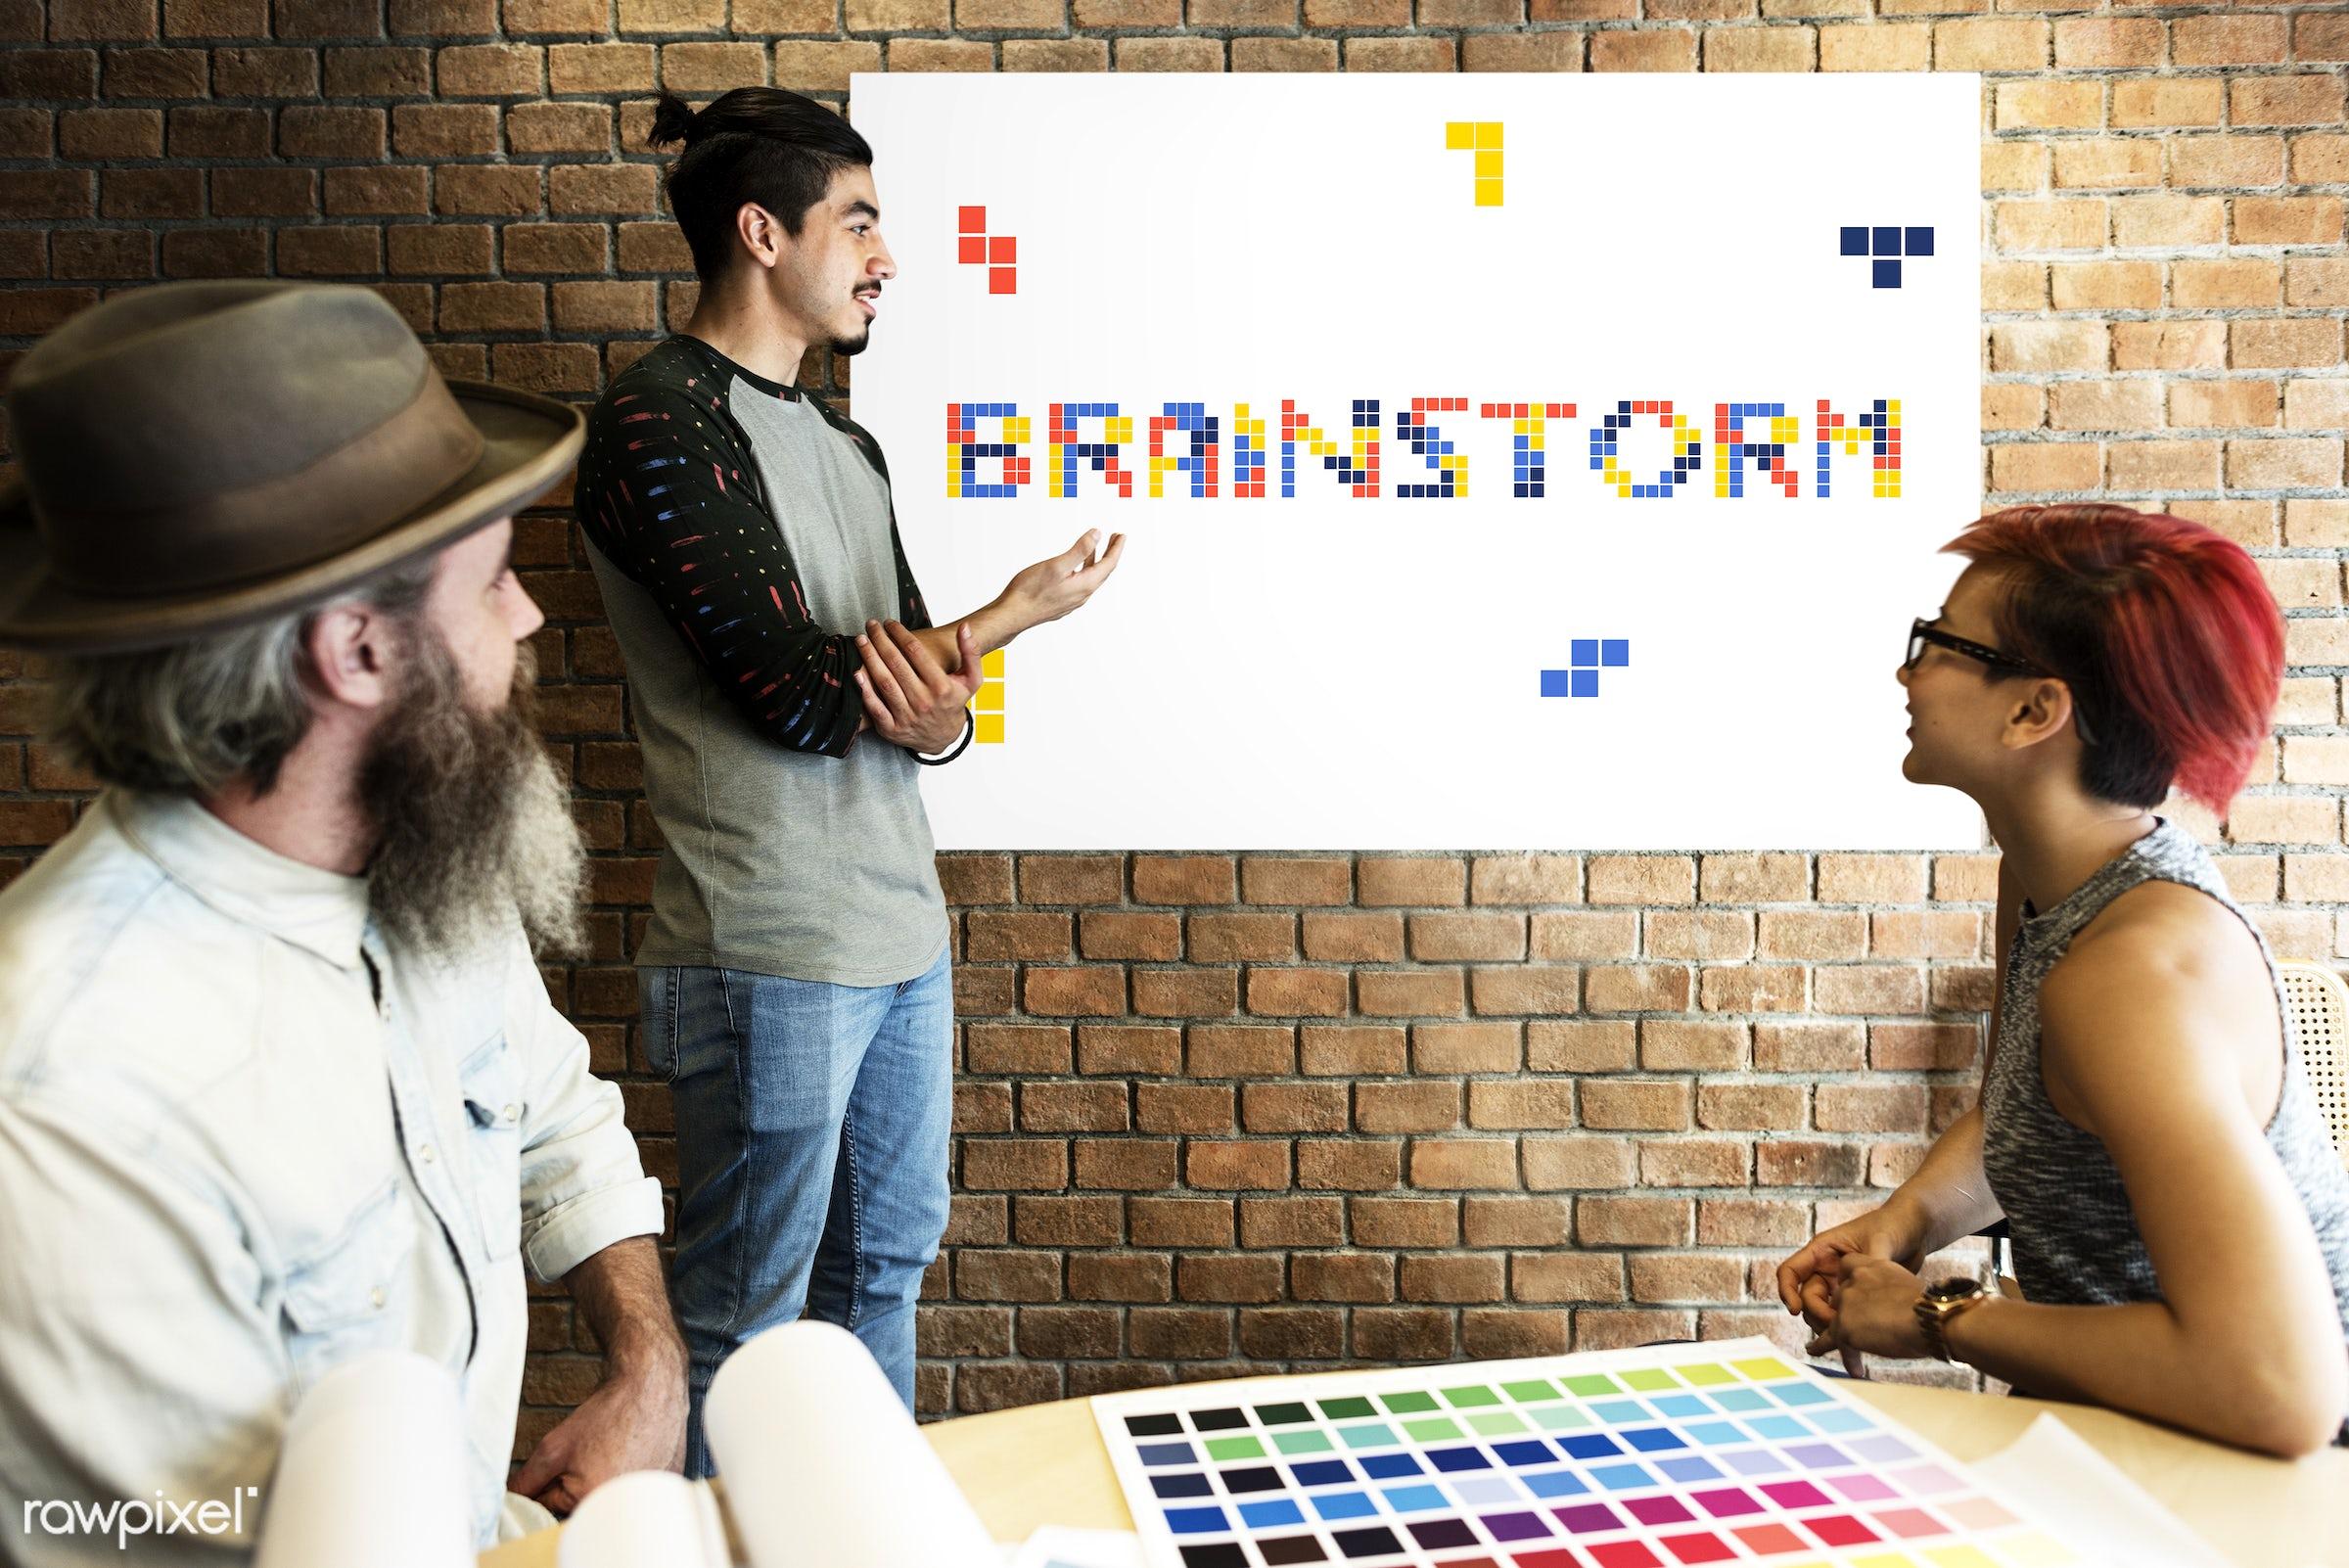 8 bit, art, beard, block, board, brainstorm, brick wall, chart, color chart, colors, design, discussion, female, game,...